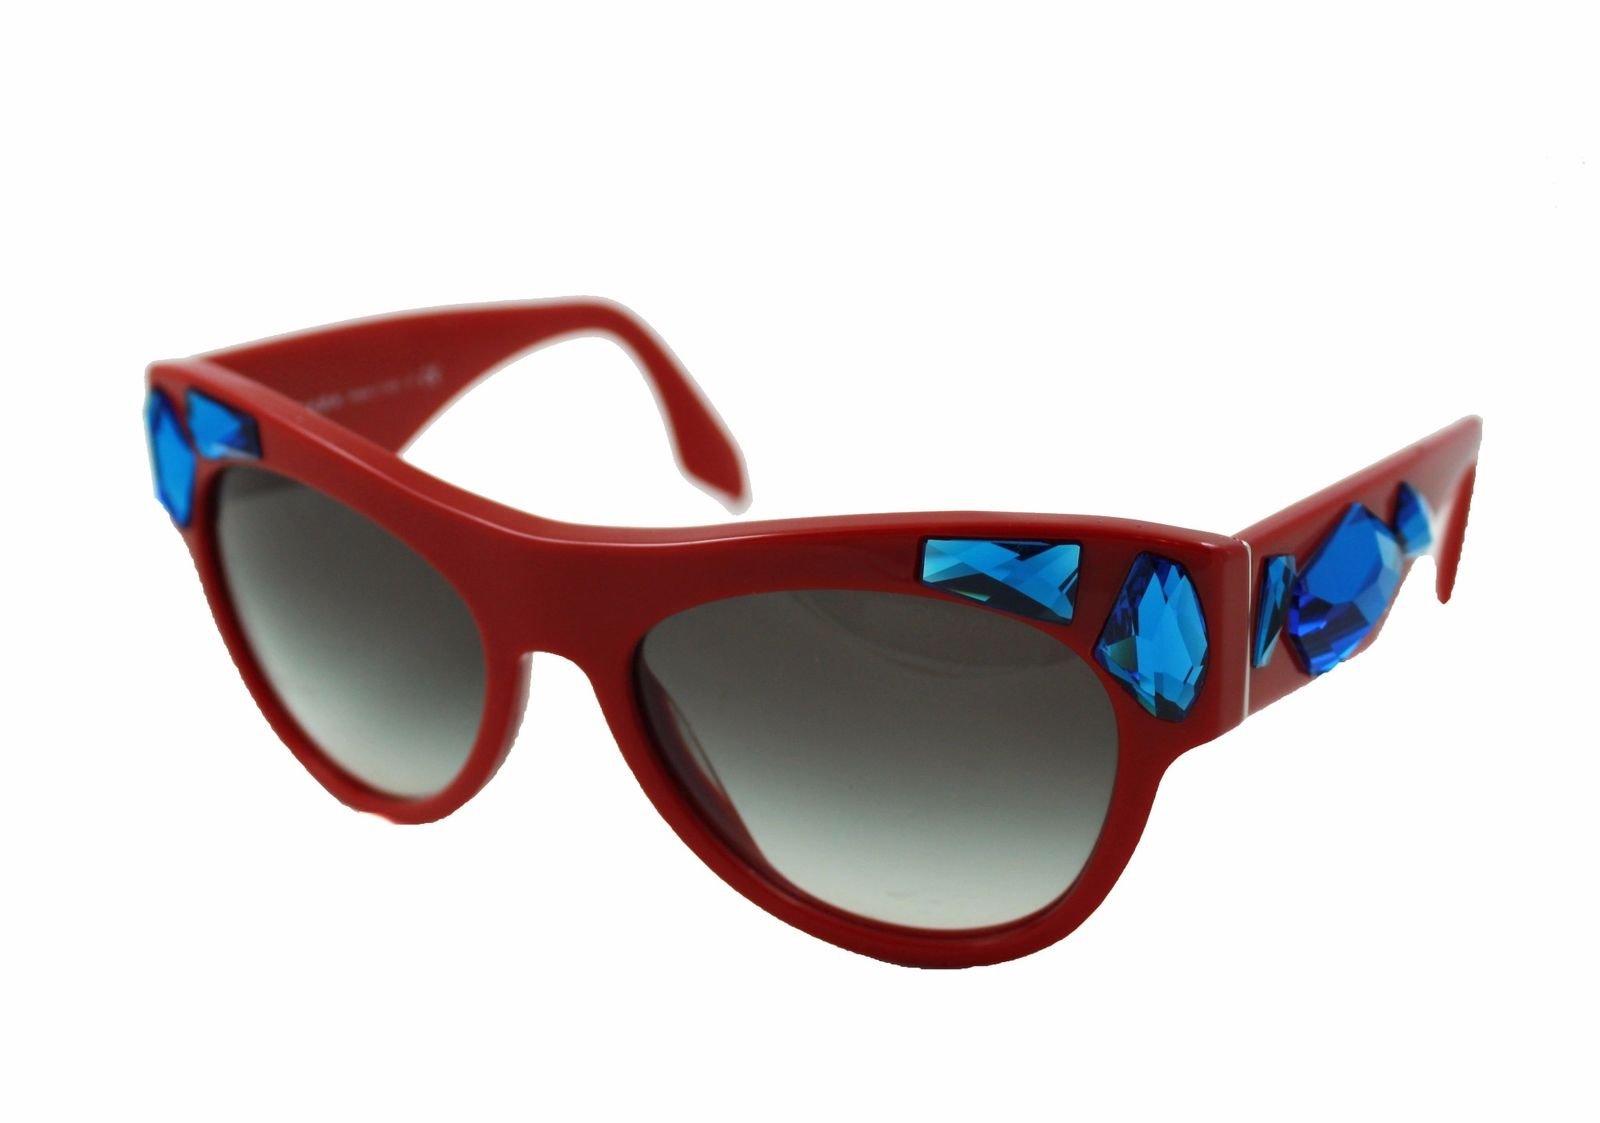 d25444d67454d Prada SPR 22Q Sunglasses Pilot Red with Blue Gems Frames Gray Gradient  Lenses